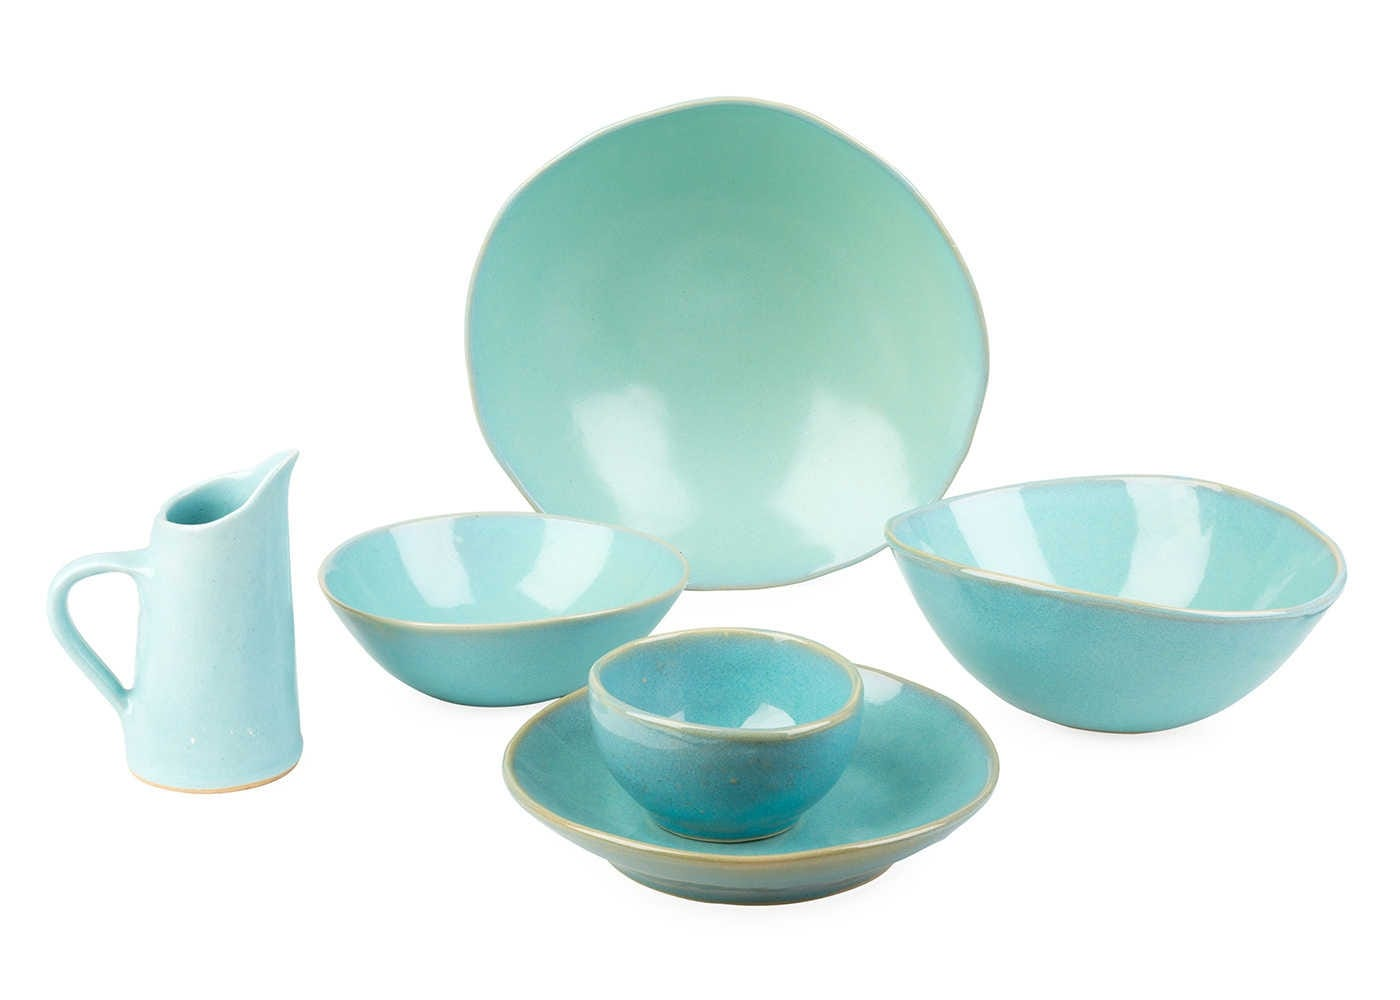 Teal Glaze Dinnerware